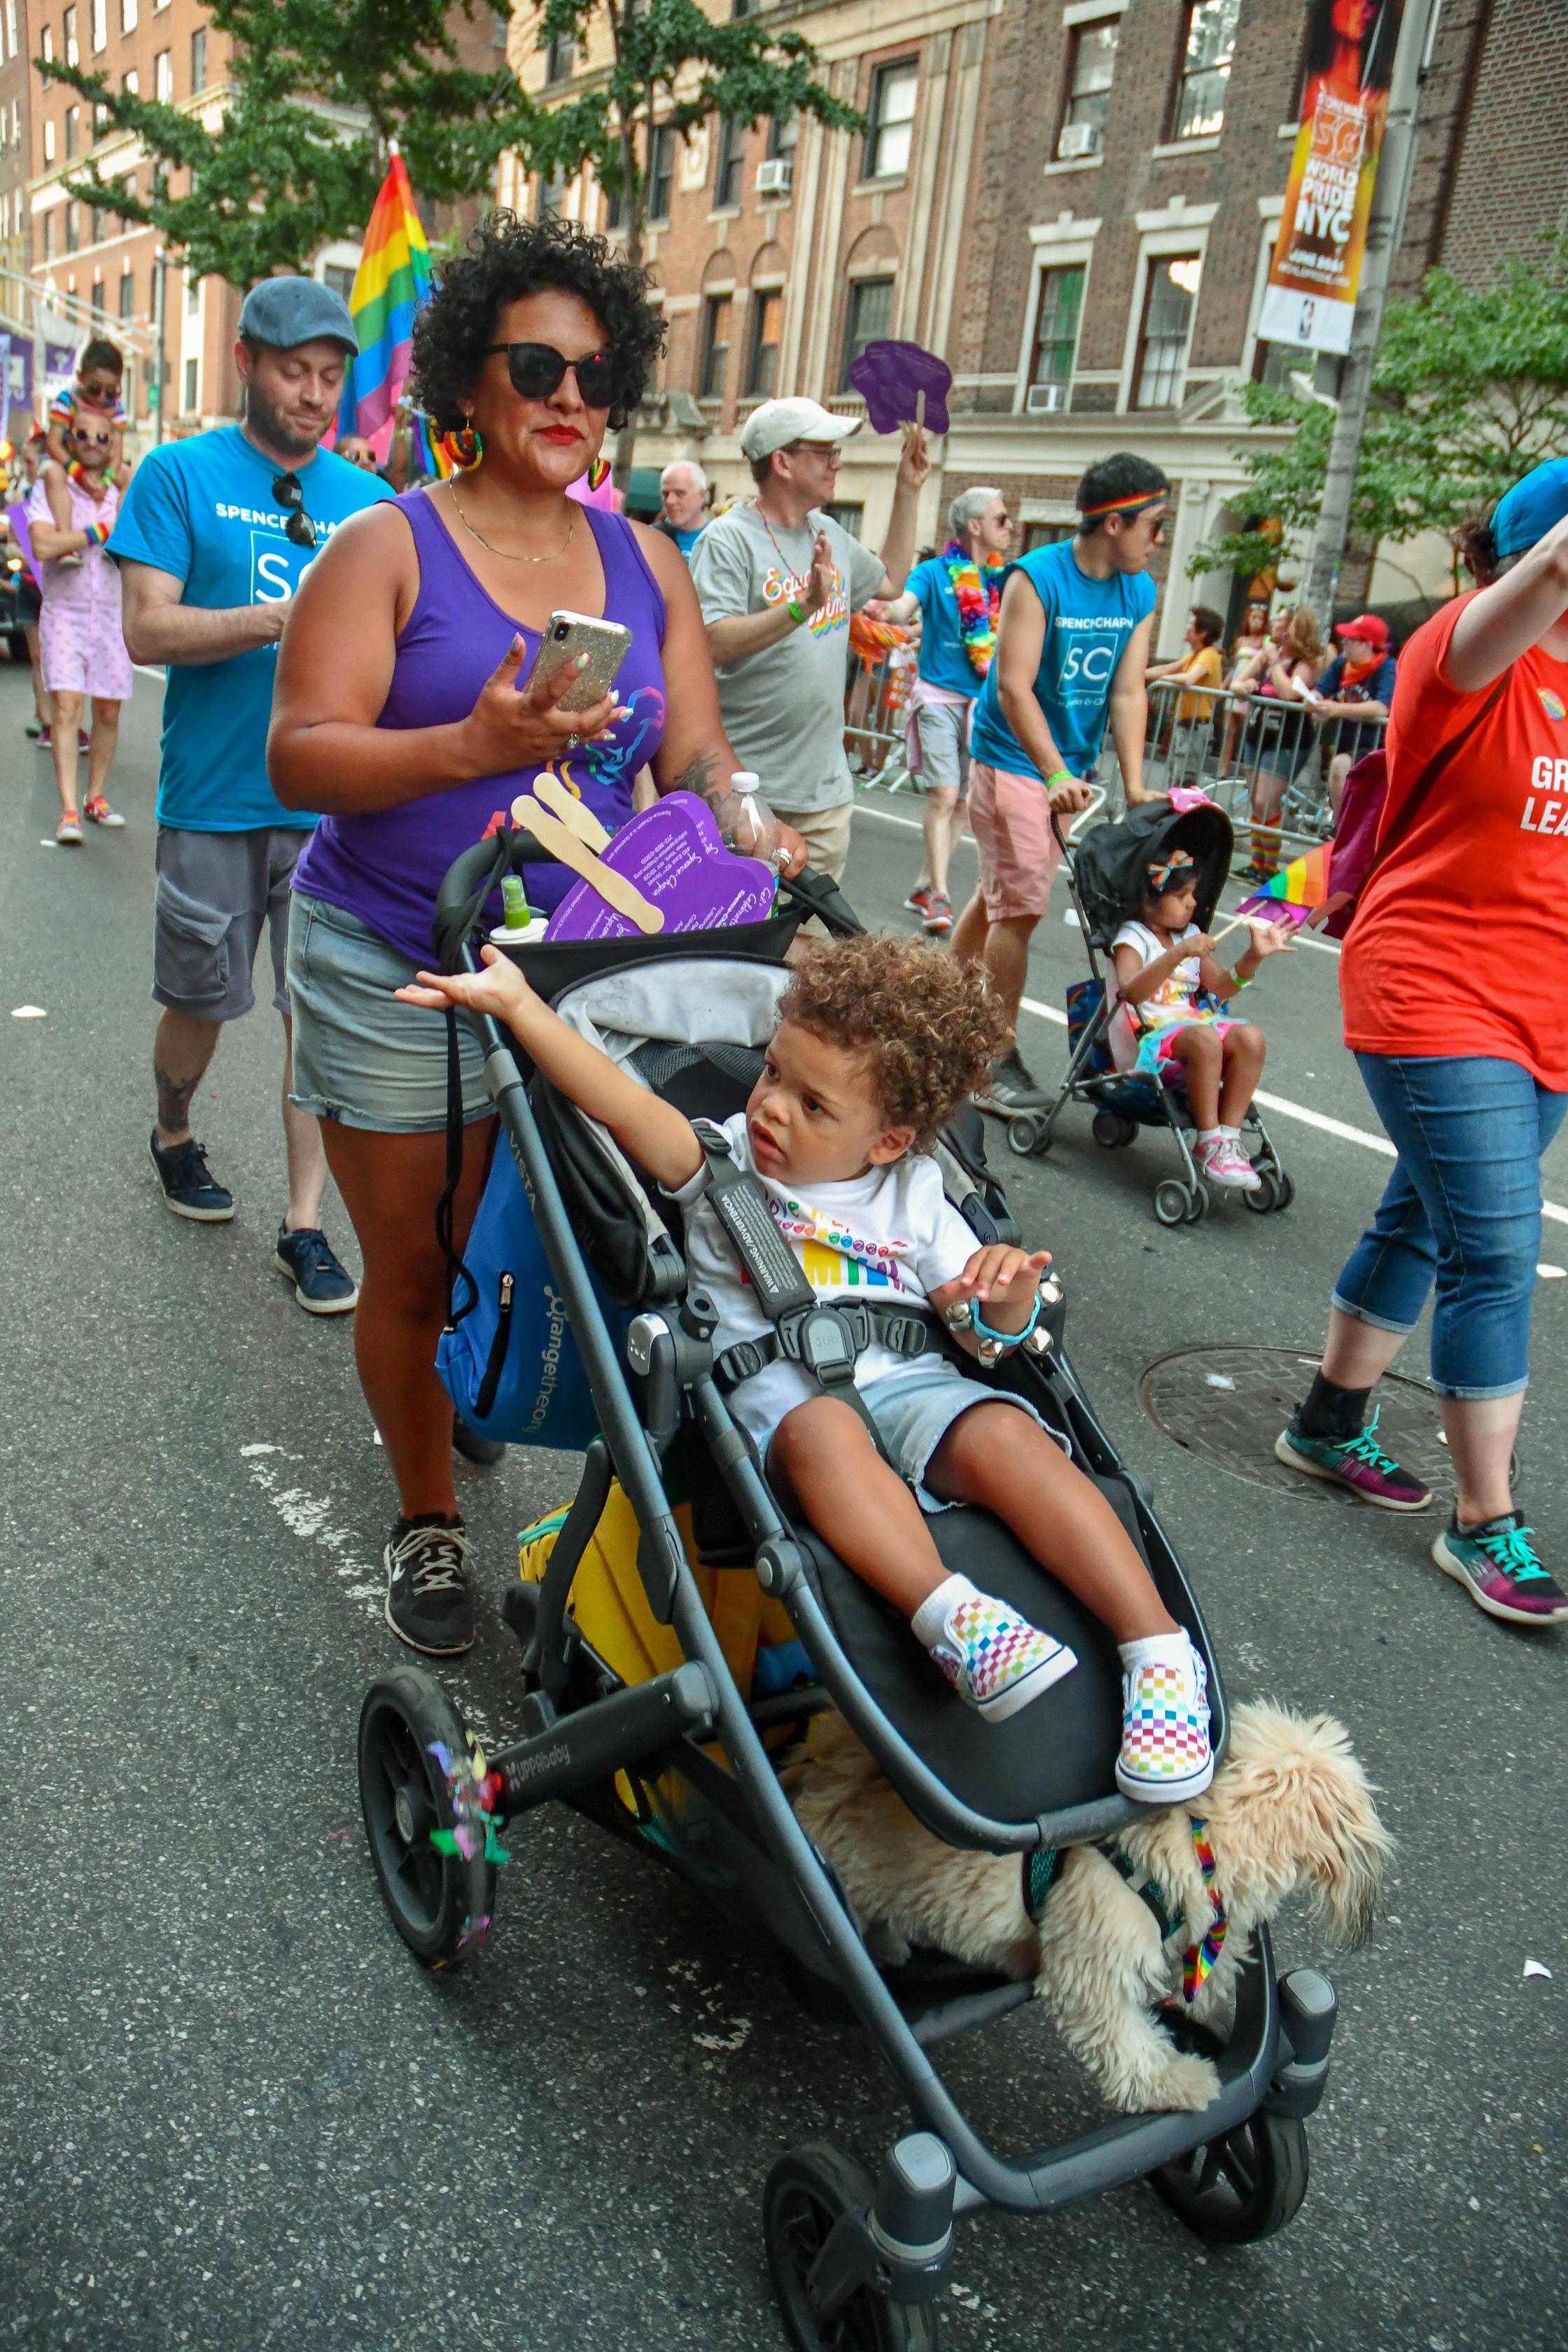 SC-PrideParade-2019_FE-251.jpg